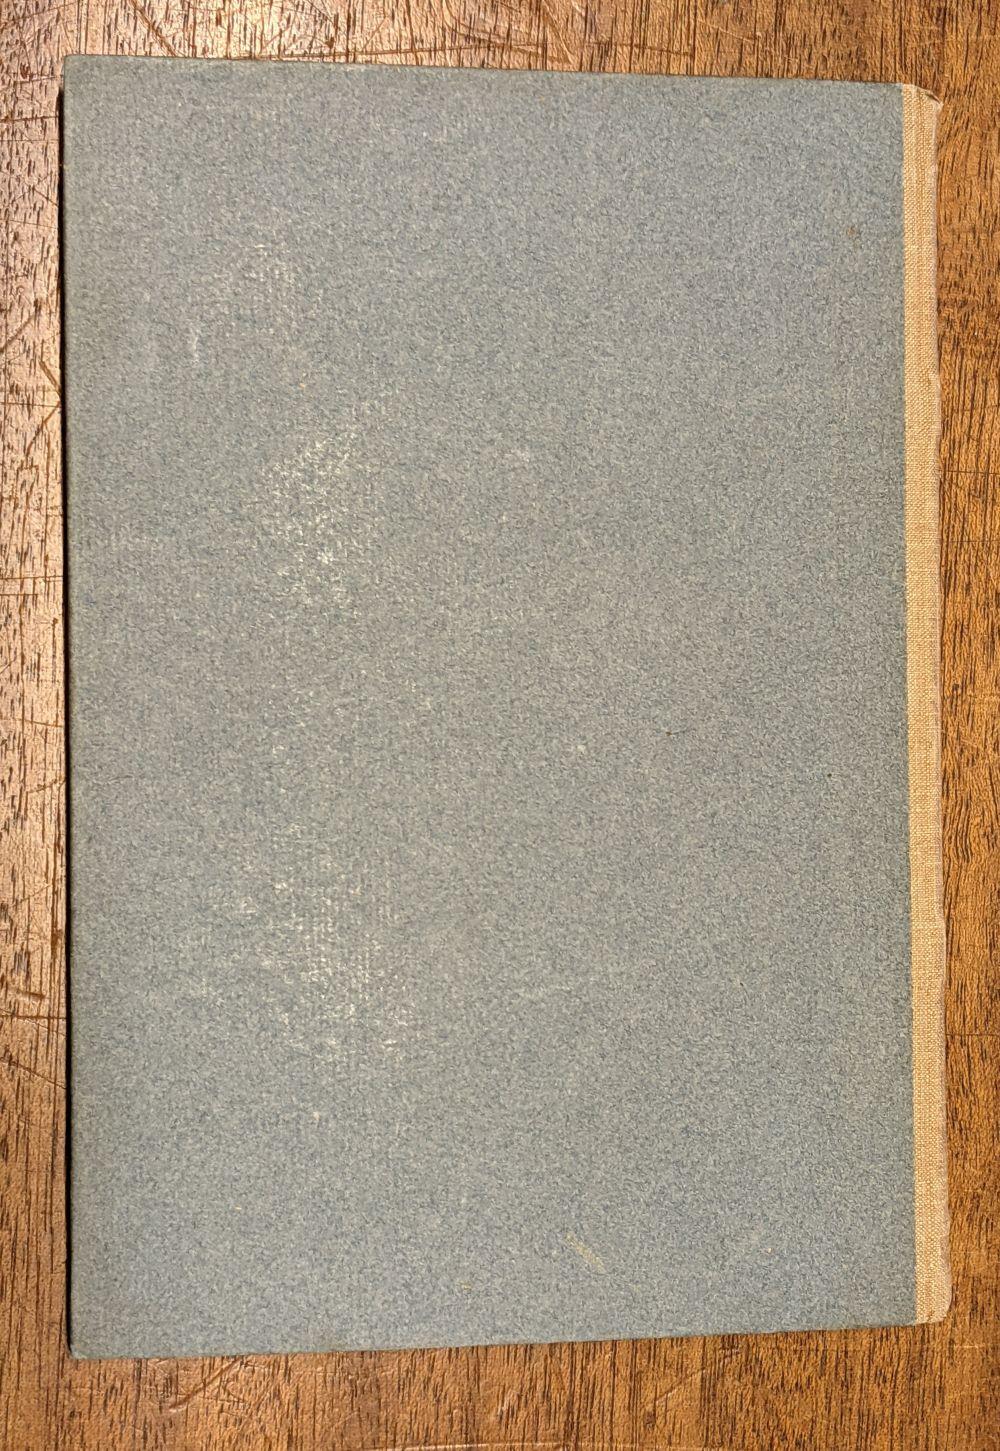 Kelmscott Press. The Romance of Sir Degrevant, 1896 - Image 4 of 8